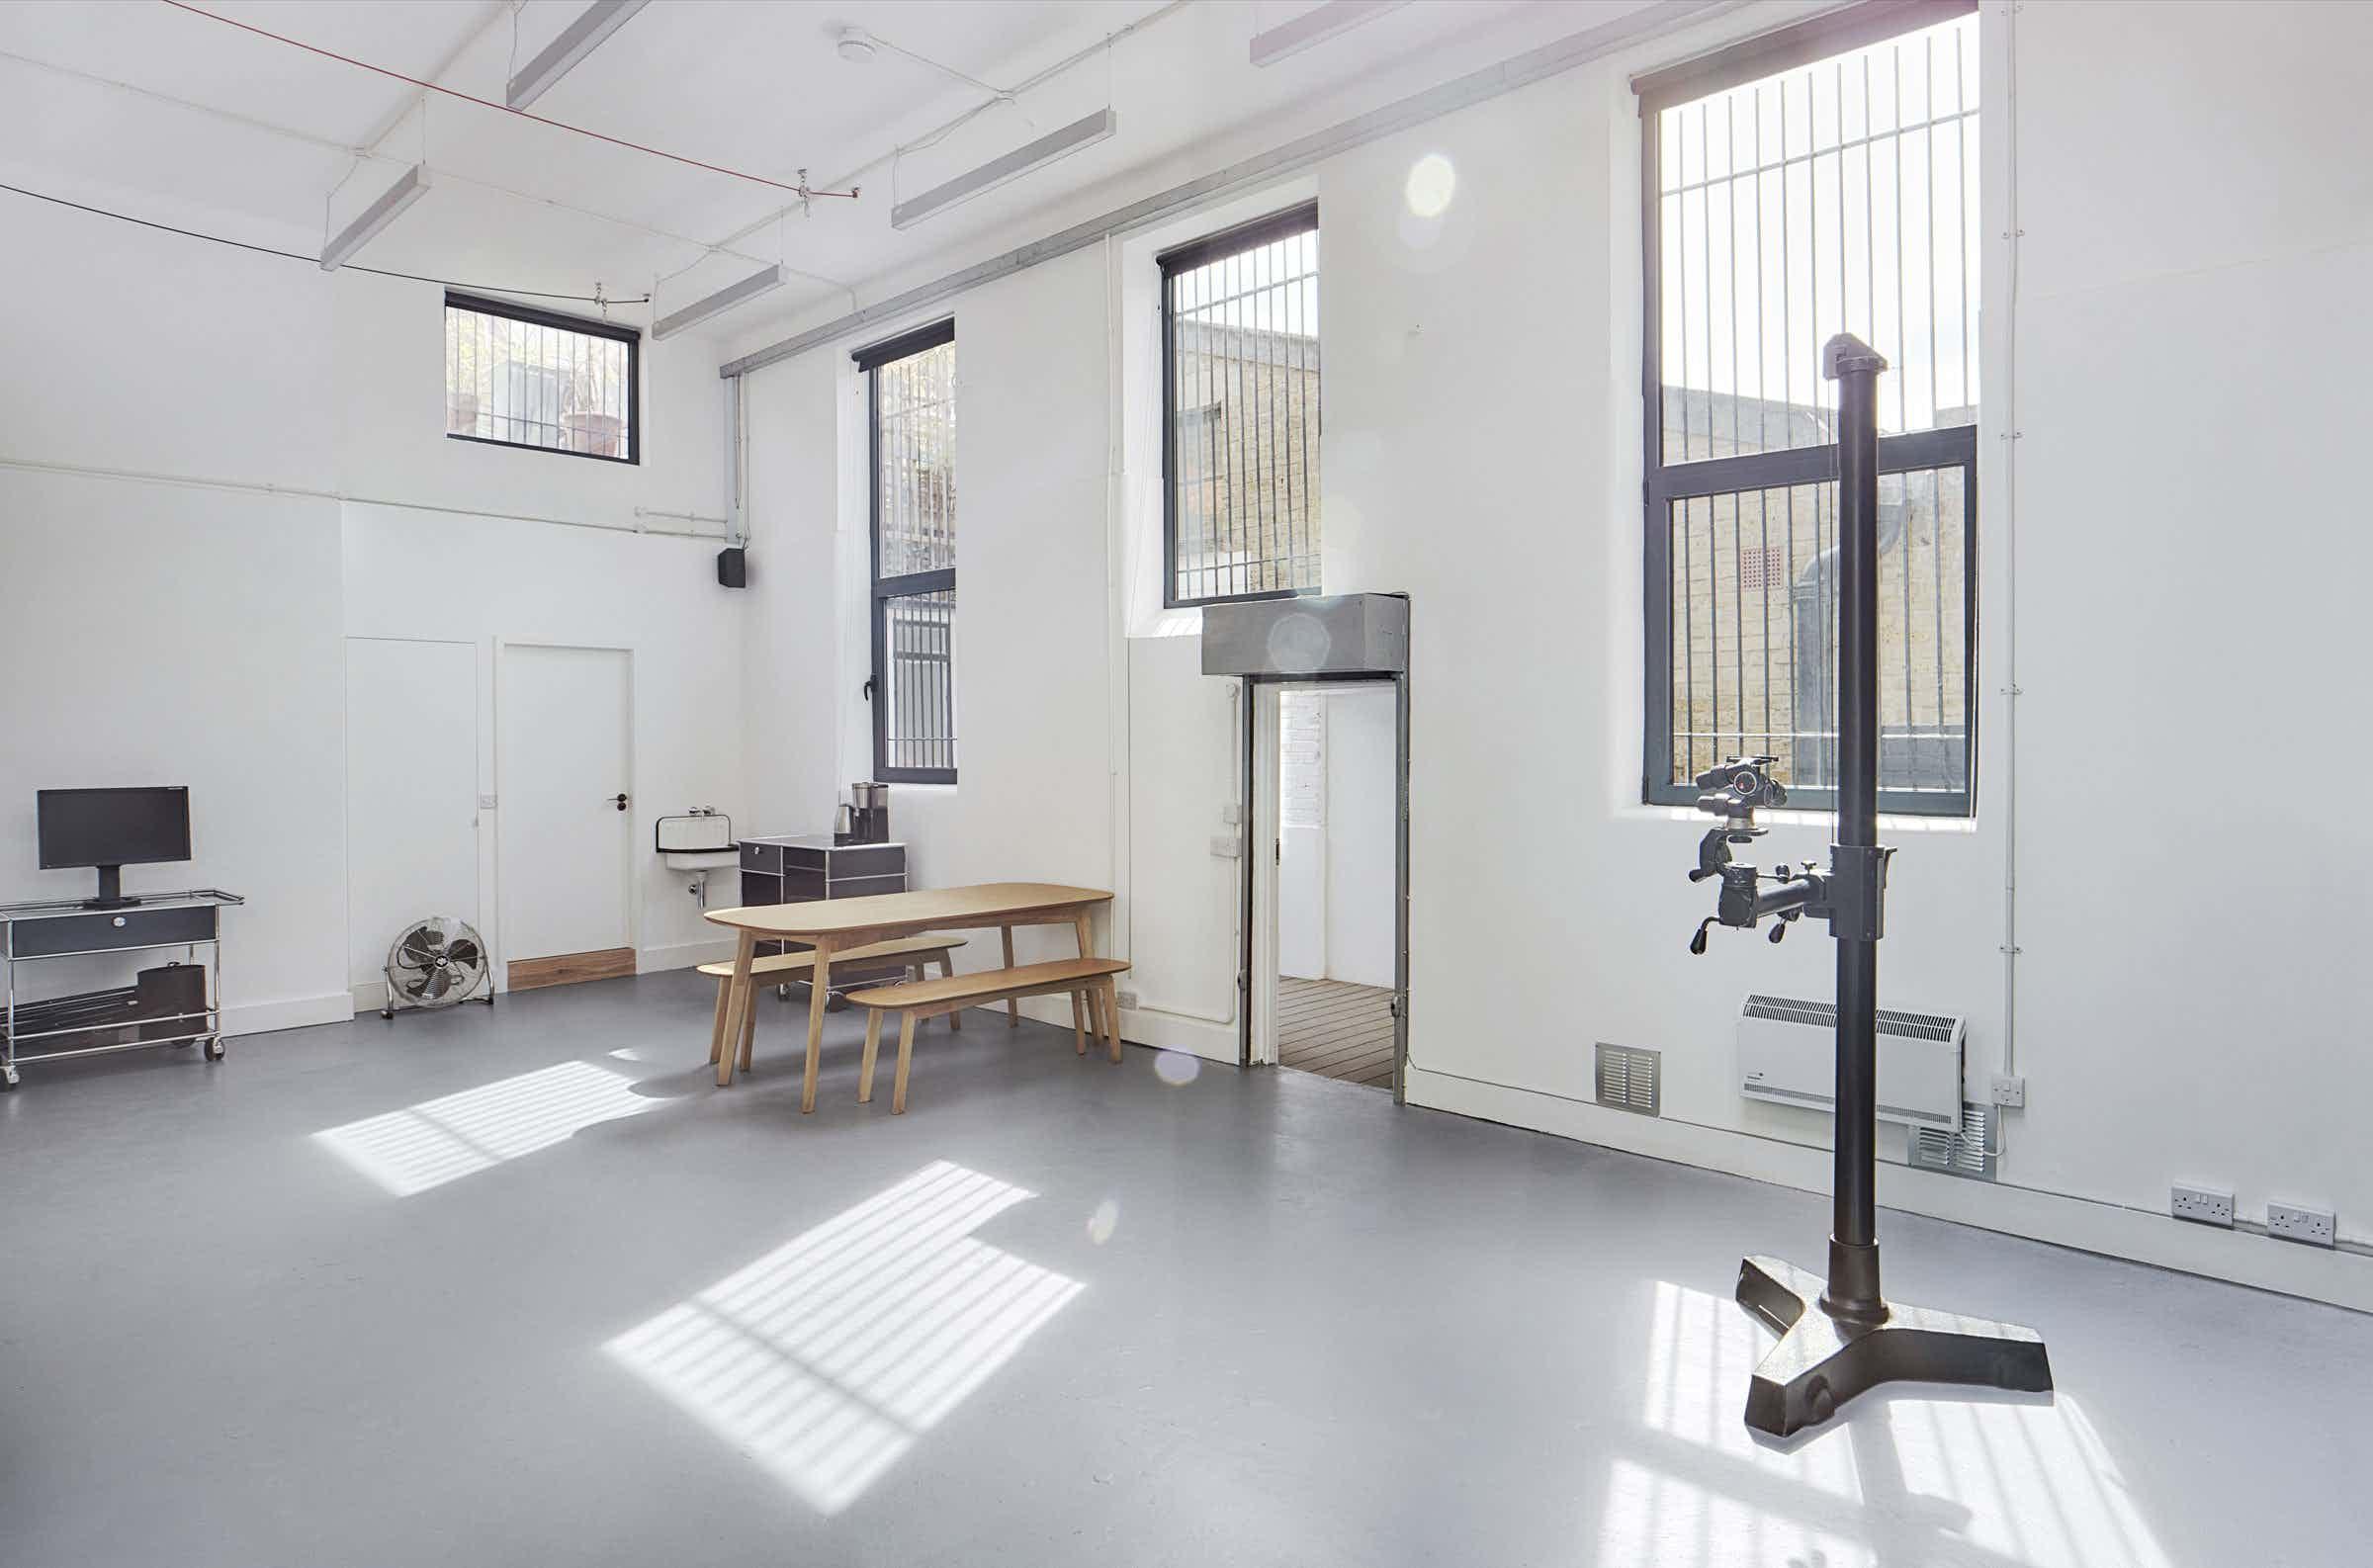 Daylight Studio, The Forge